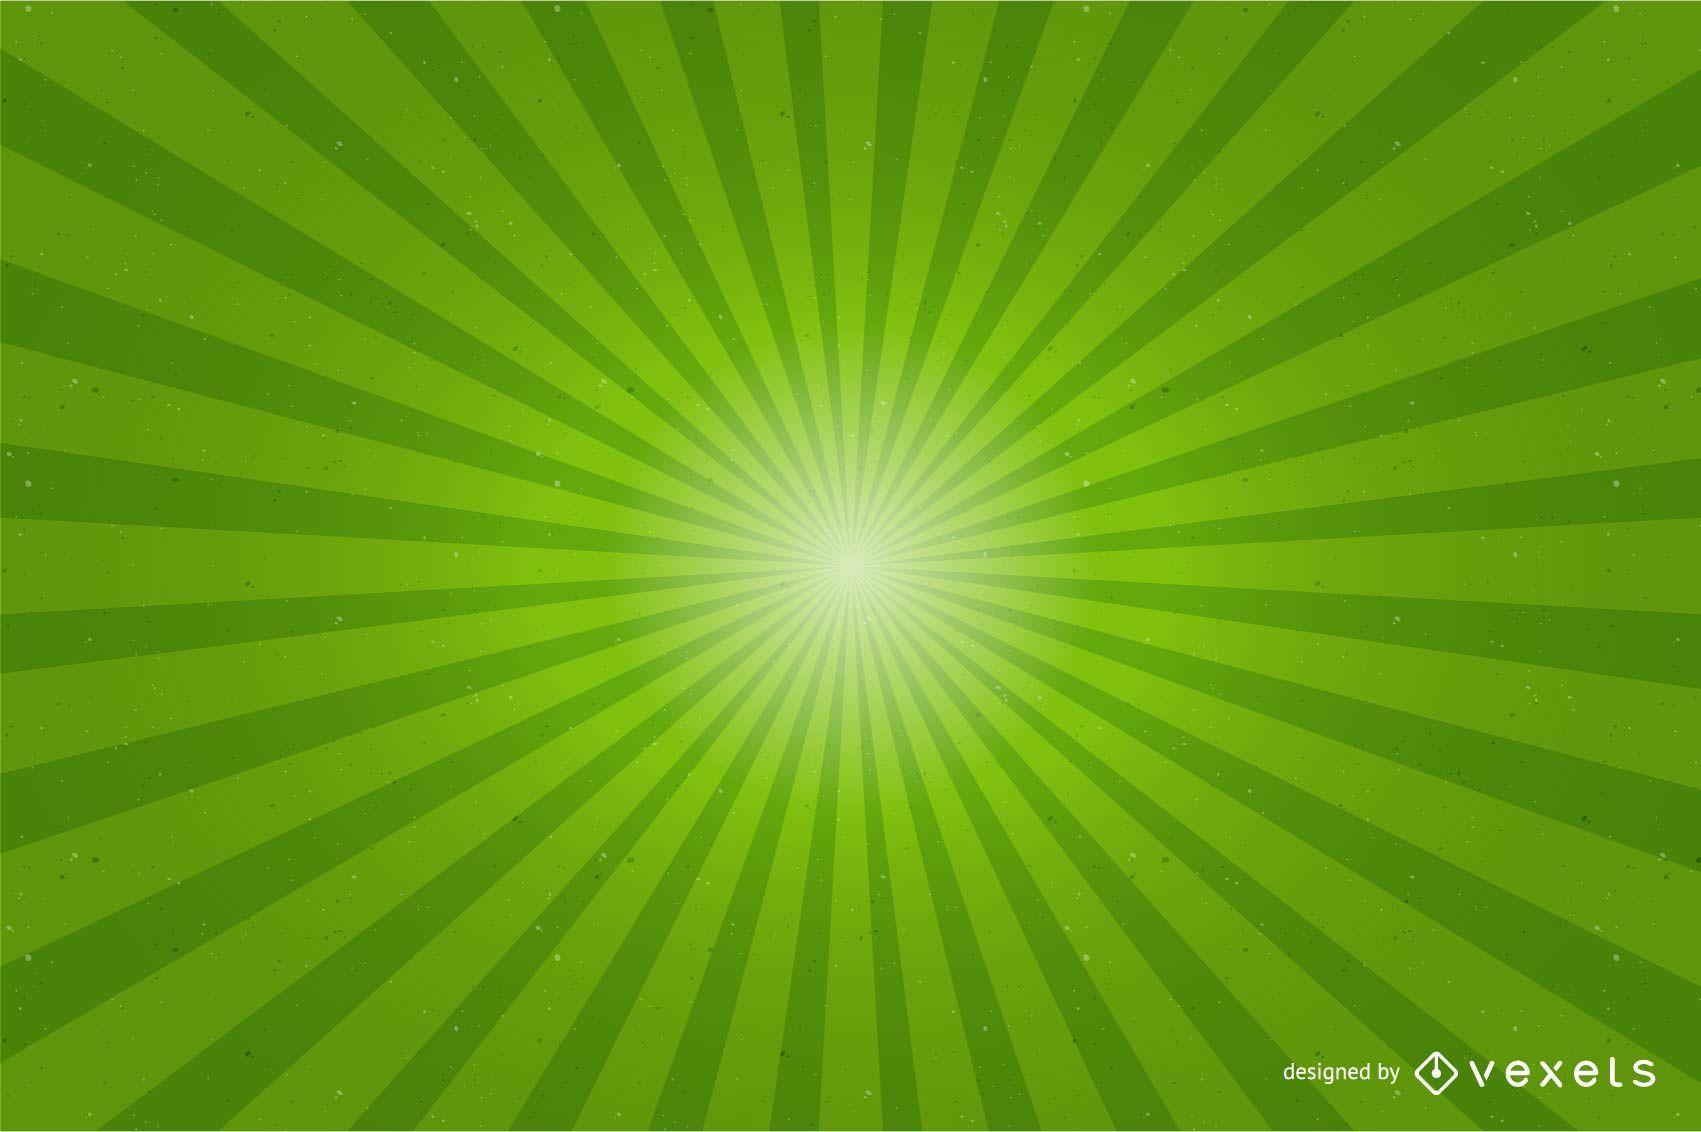 Fondo verde brillante Sunburst